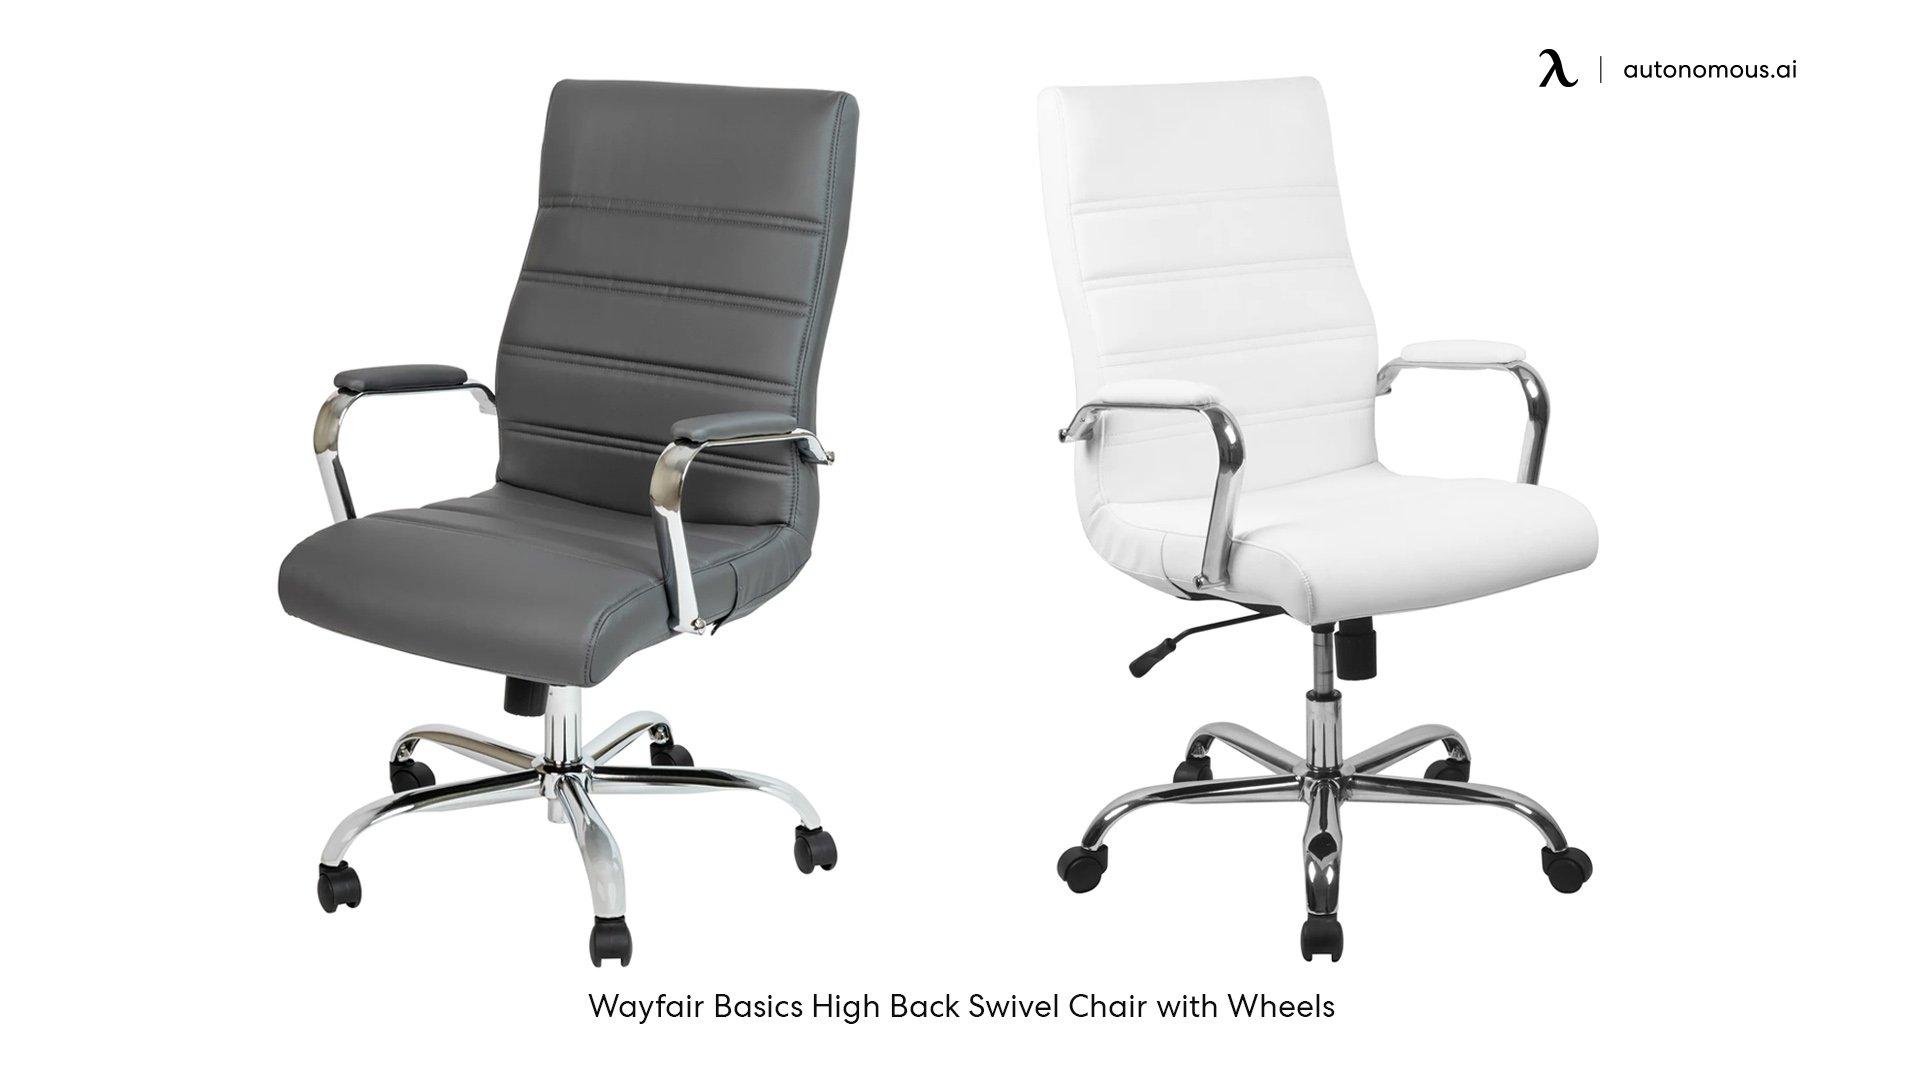 Wayfair Basics High Back Swivel Chair with Wheels